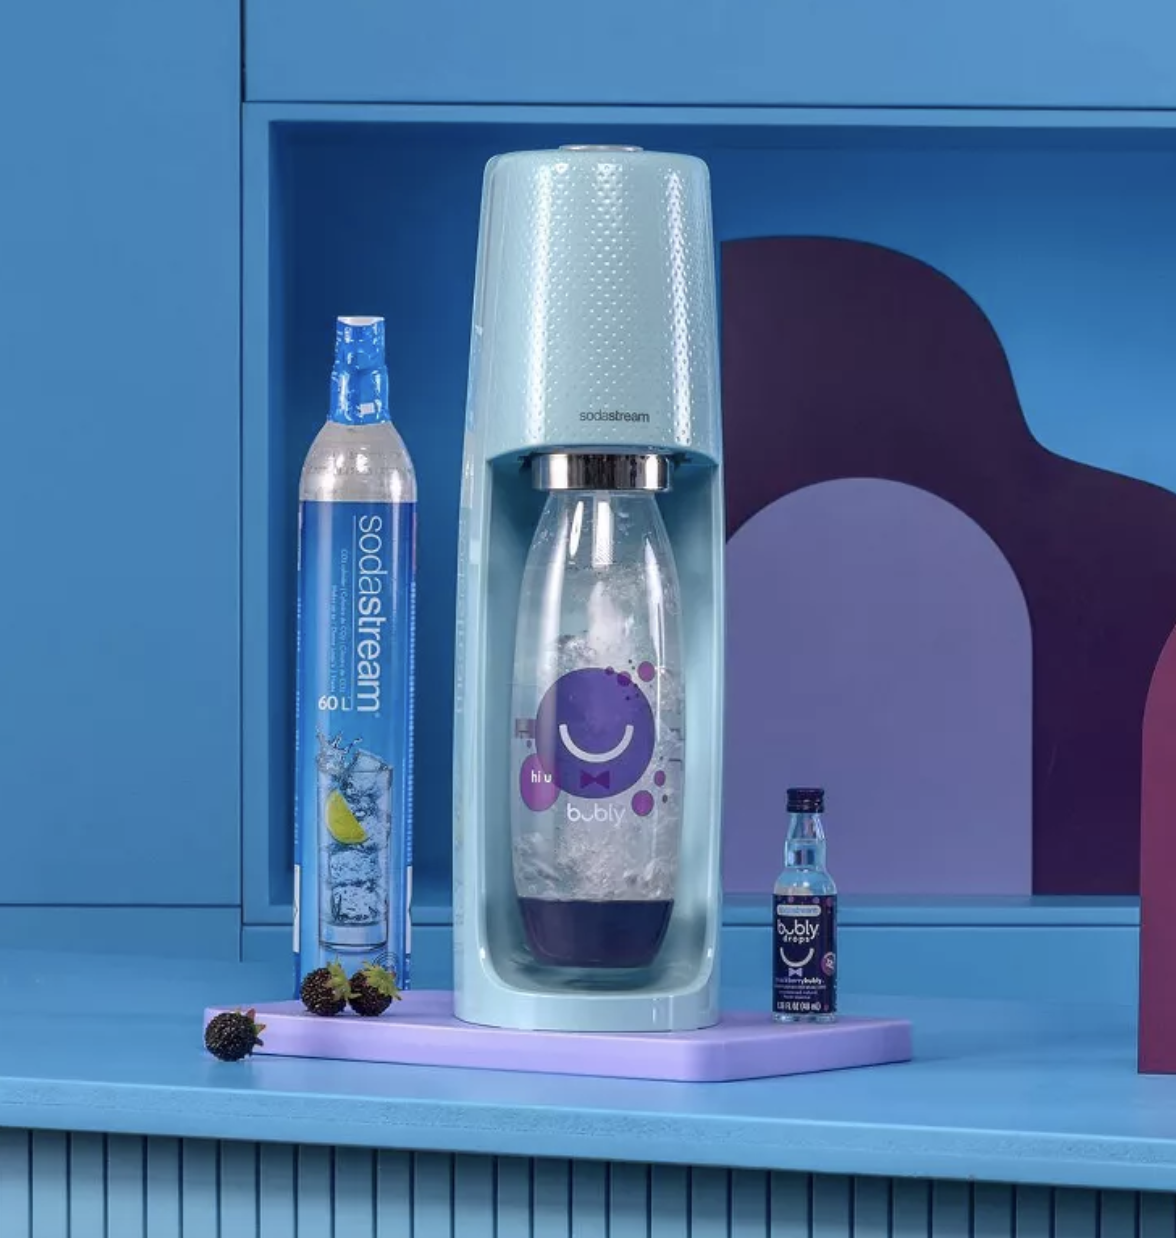 the blue SodaStream